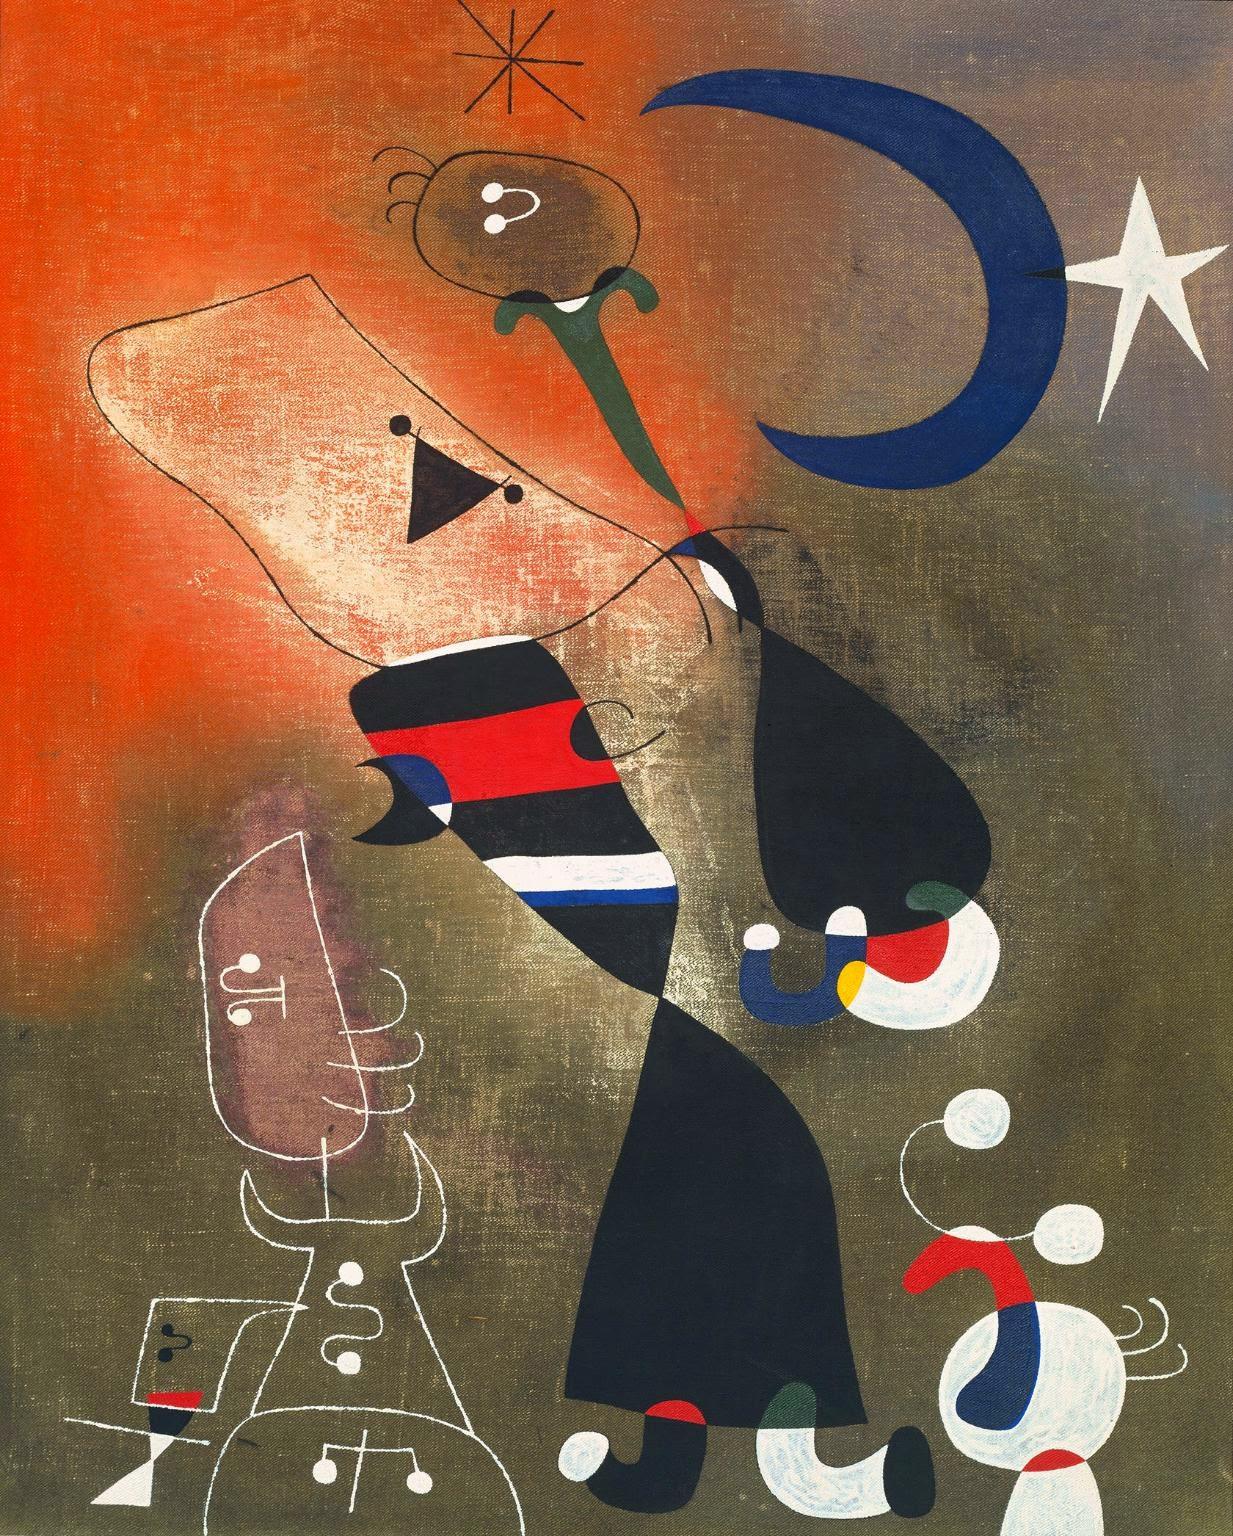 Mulher e Pássaro ao Luar - Miró, Joan e suas principais pinturas